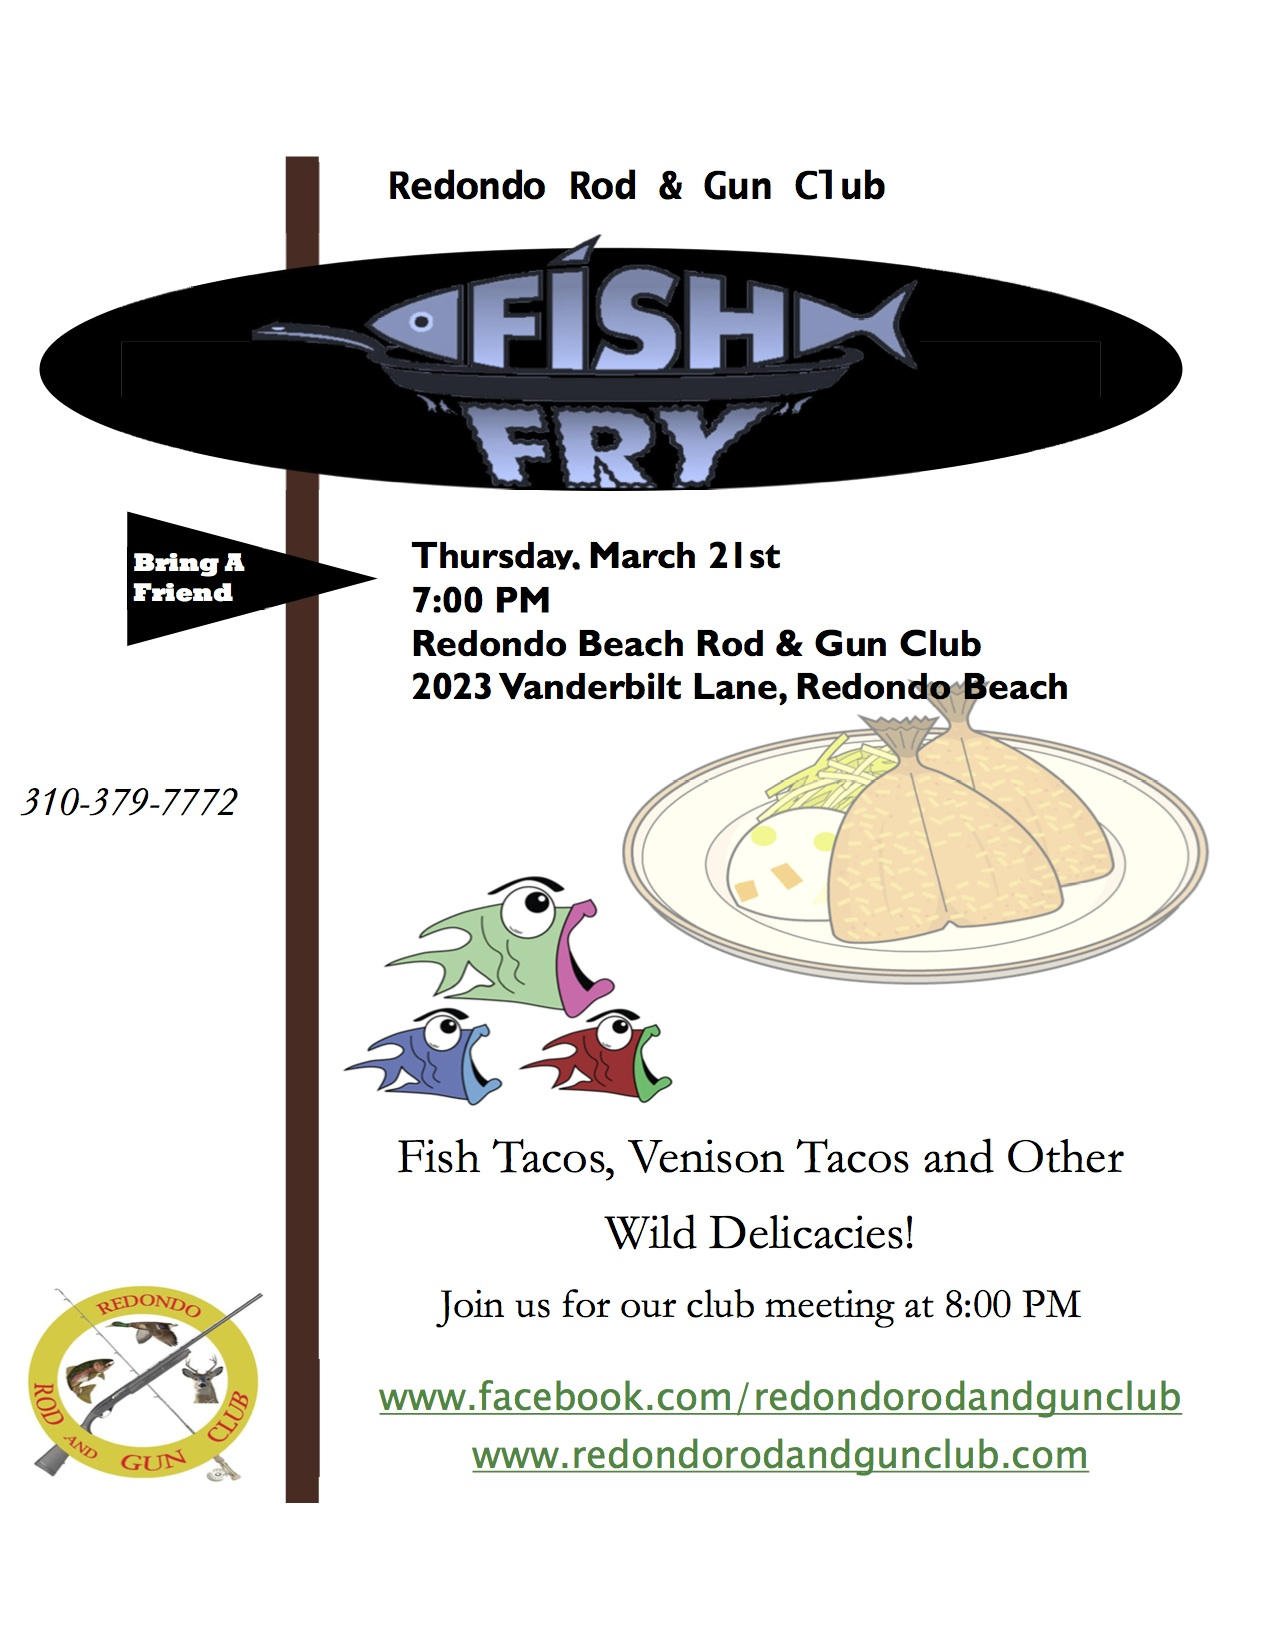 Fish Fry March 2013 Redondo Rod And Gun Club